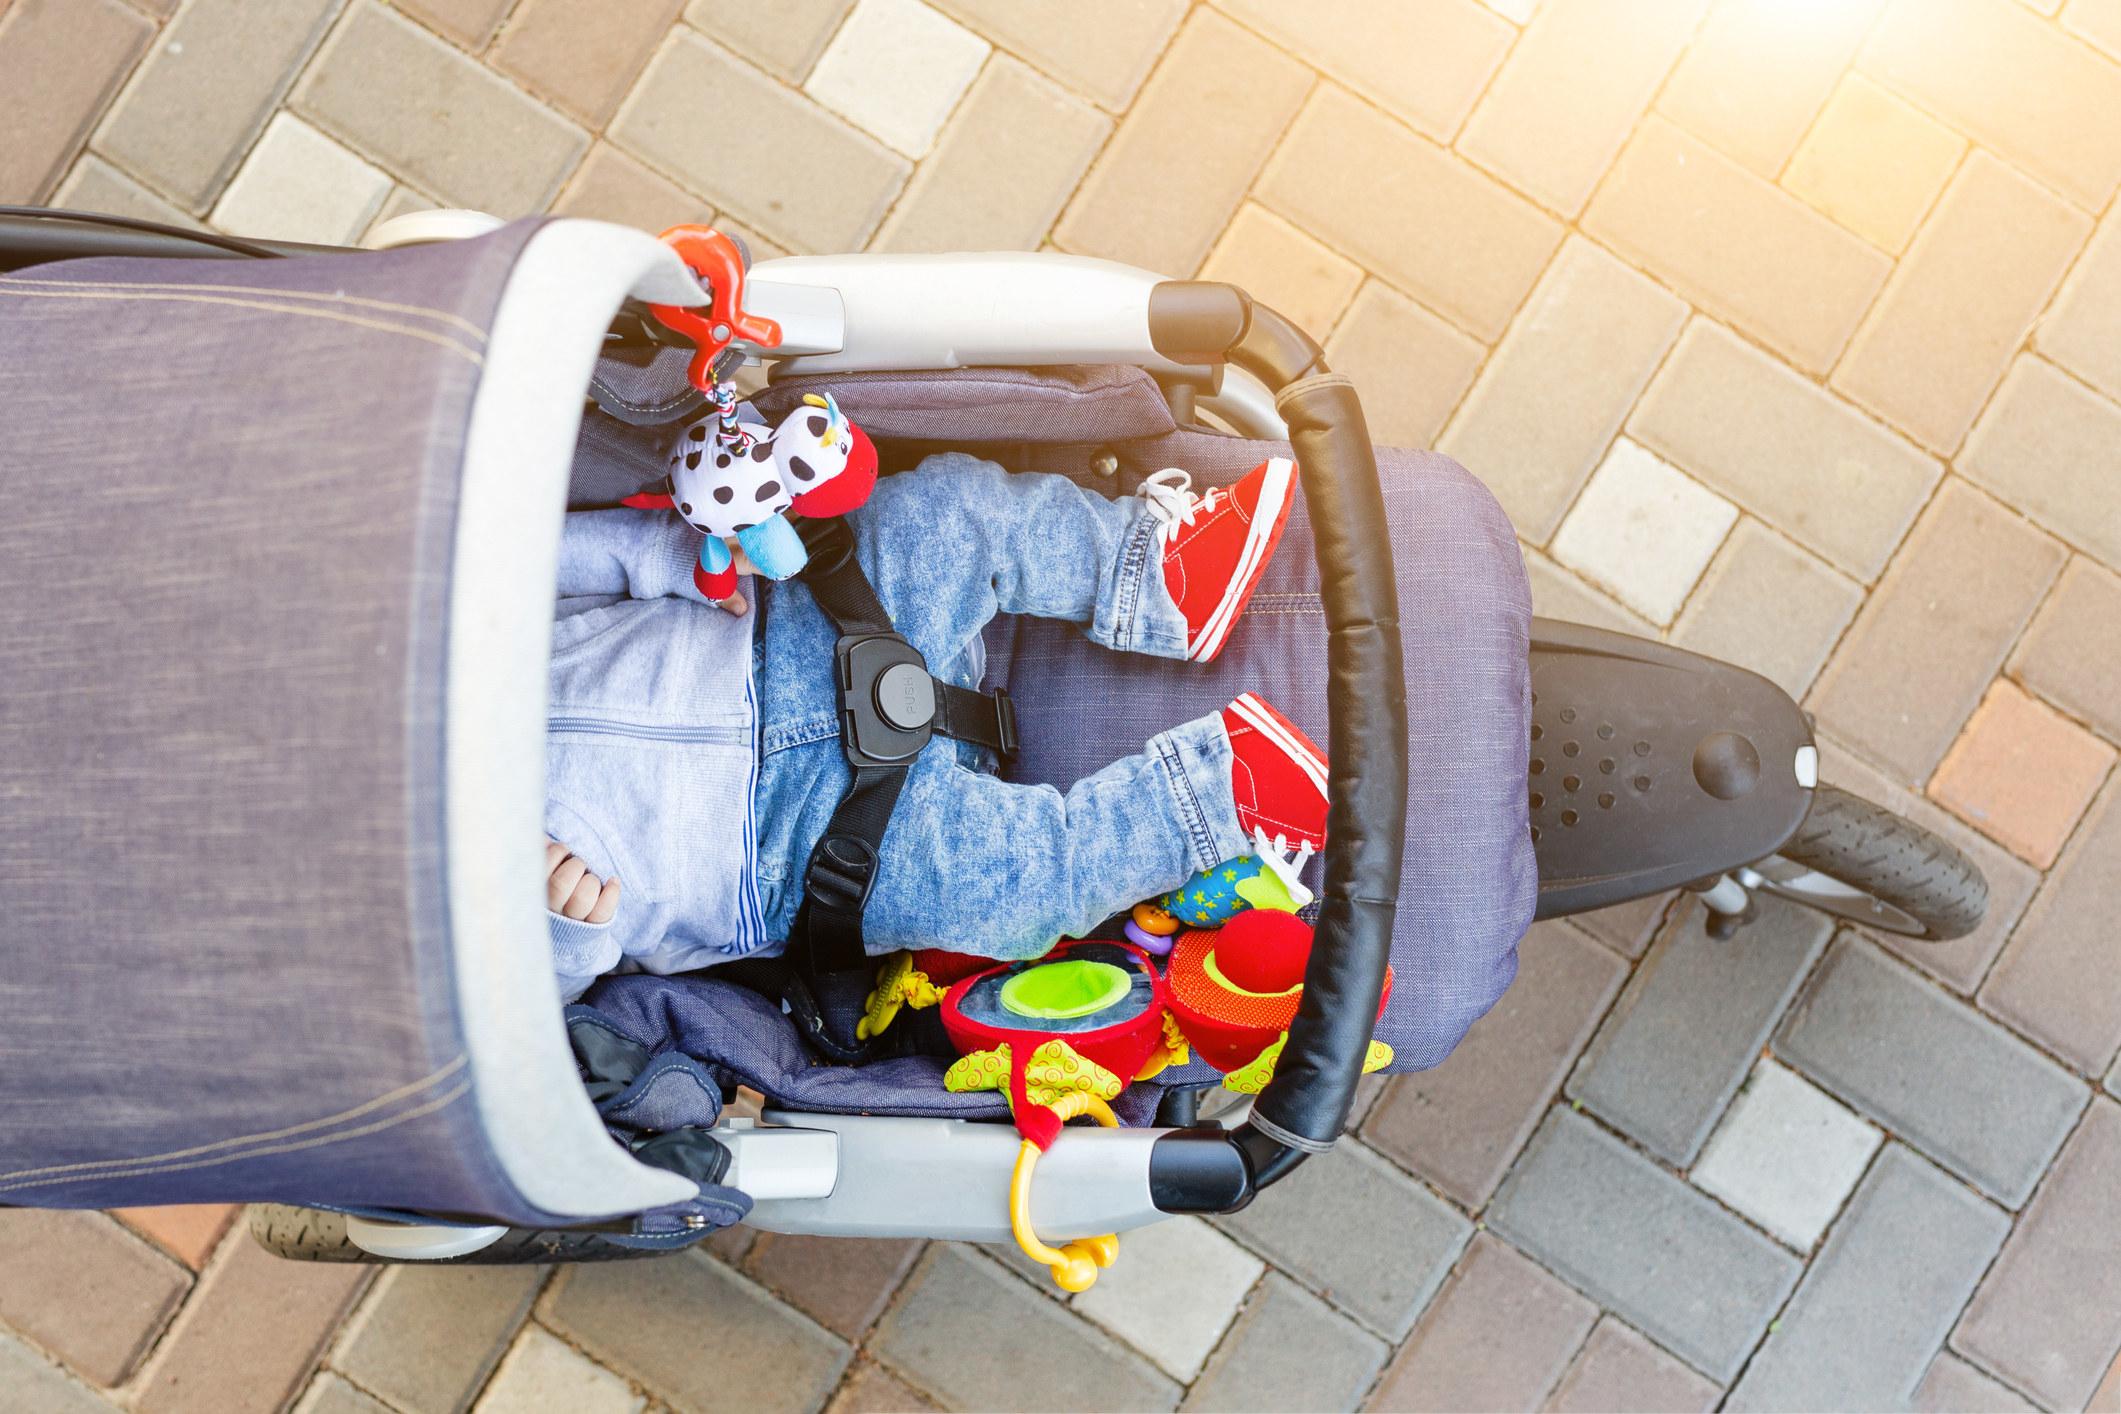 A baby sleeping in a stroller.